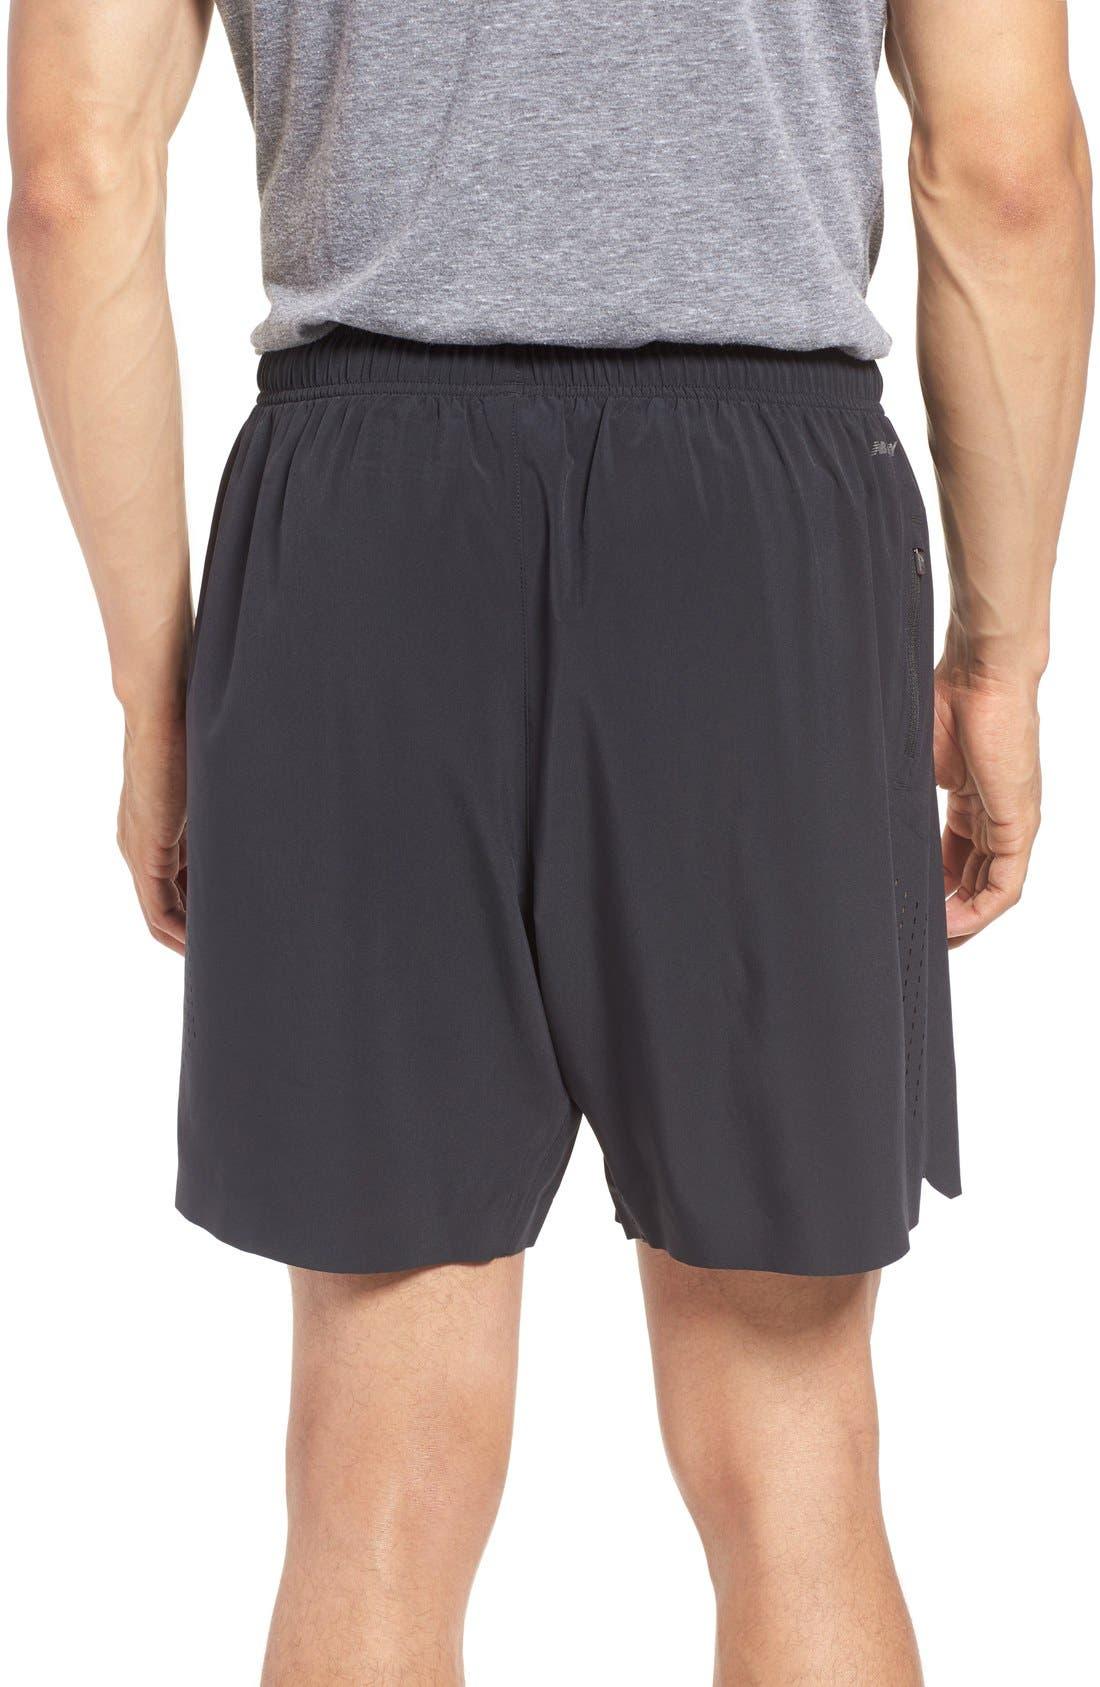 'Shift' Athletic Fit Training Shorts,                             Alternate thumbnail 2, color,                             001